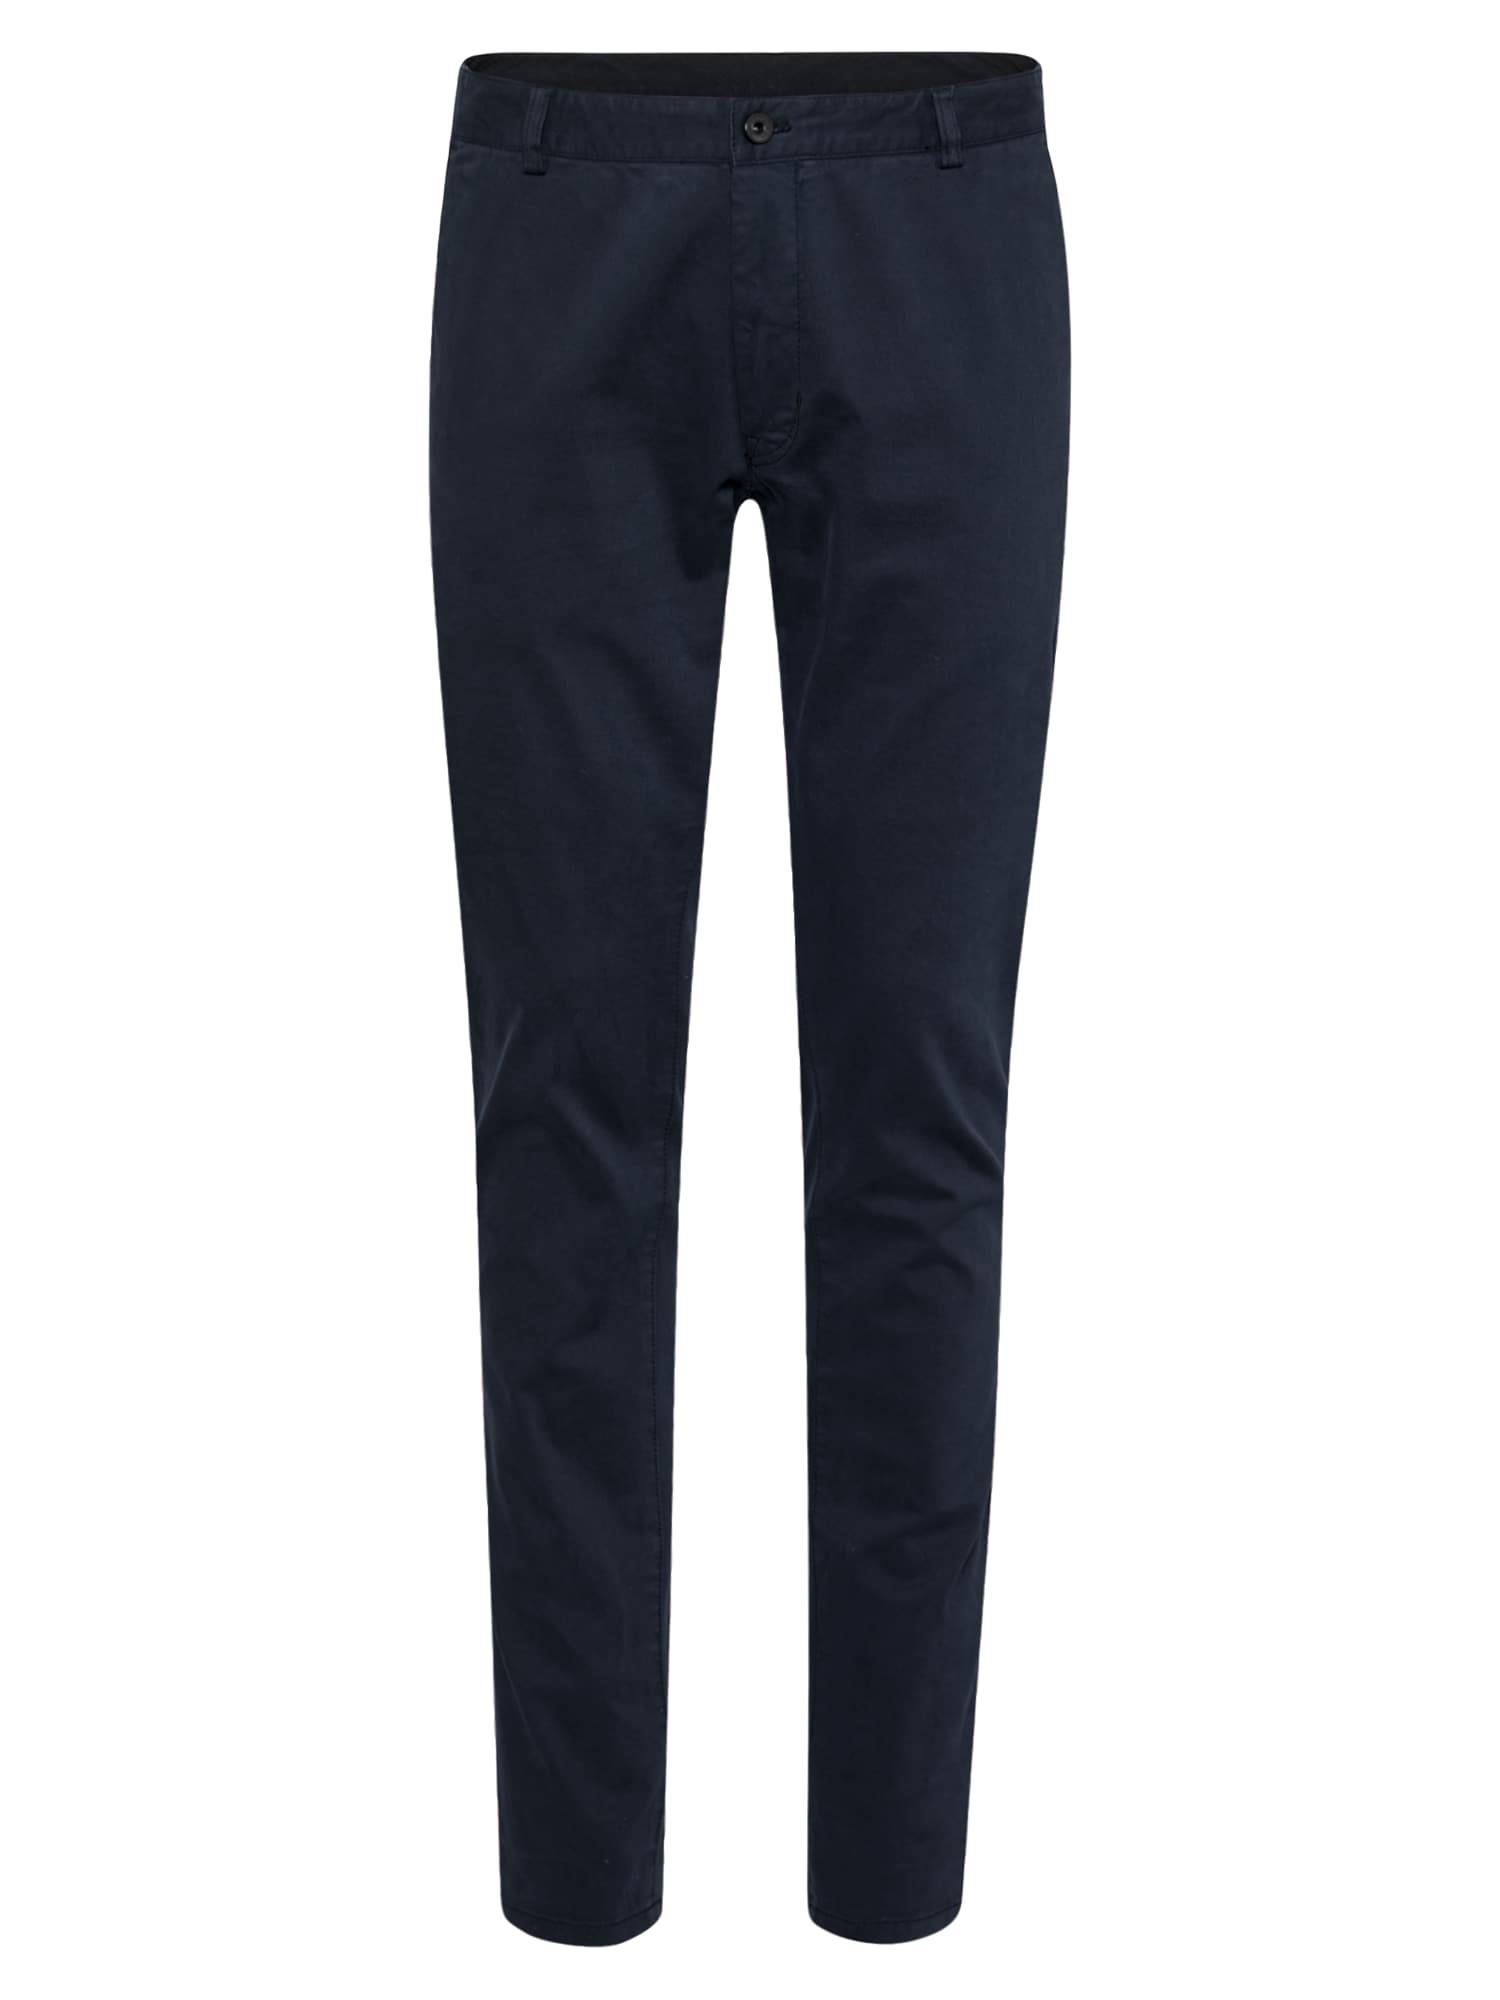 Tiger of Sweden Pantalon 'TRANSIT 4.'  - Bleu - Taille: 50 - male